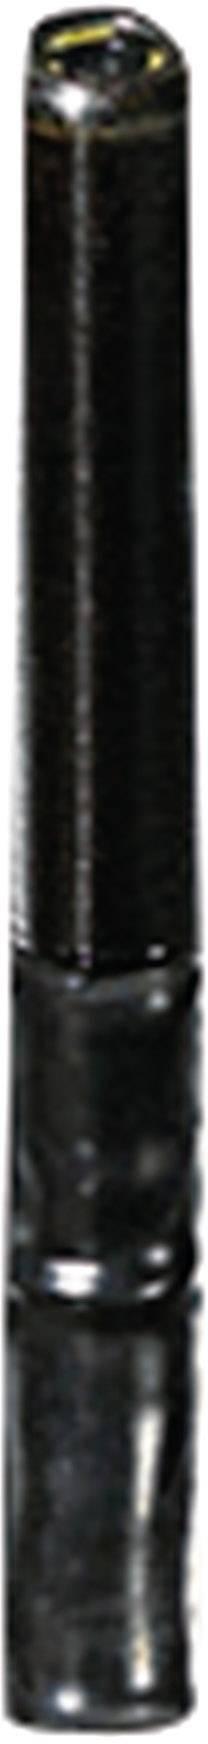 Sonda s kamerou 4WAY, FA8100C, 1 m/ Ø 7,5 mm pro endoskopy Voltcraft BS-500, BS-1000T